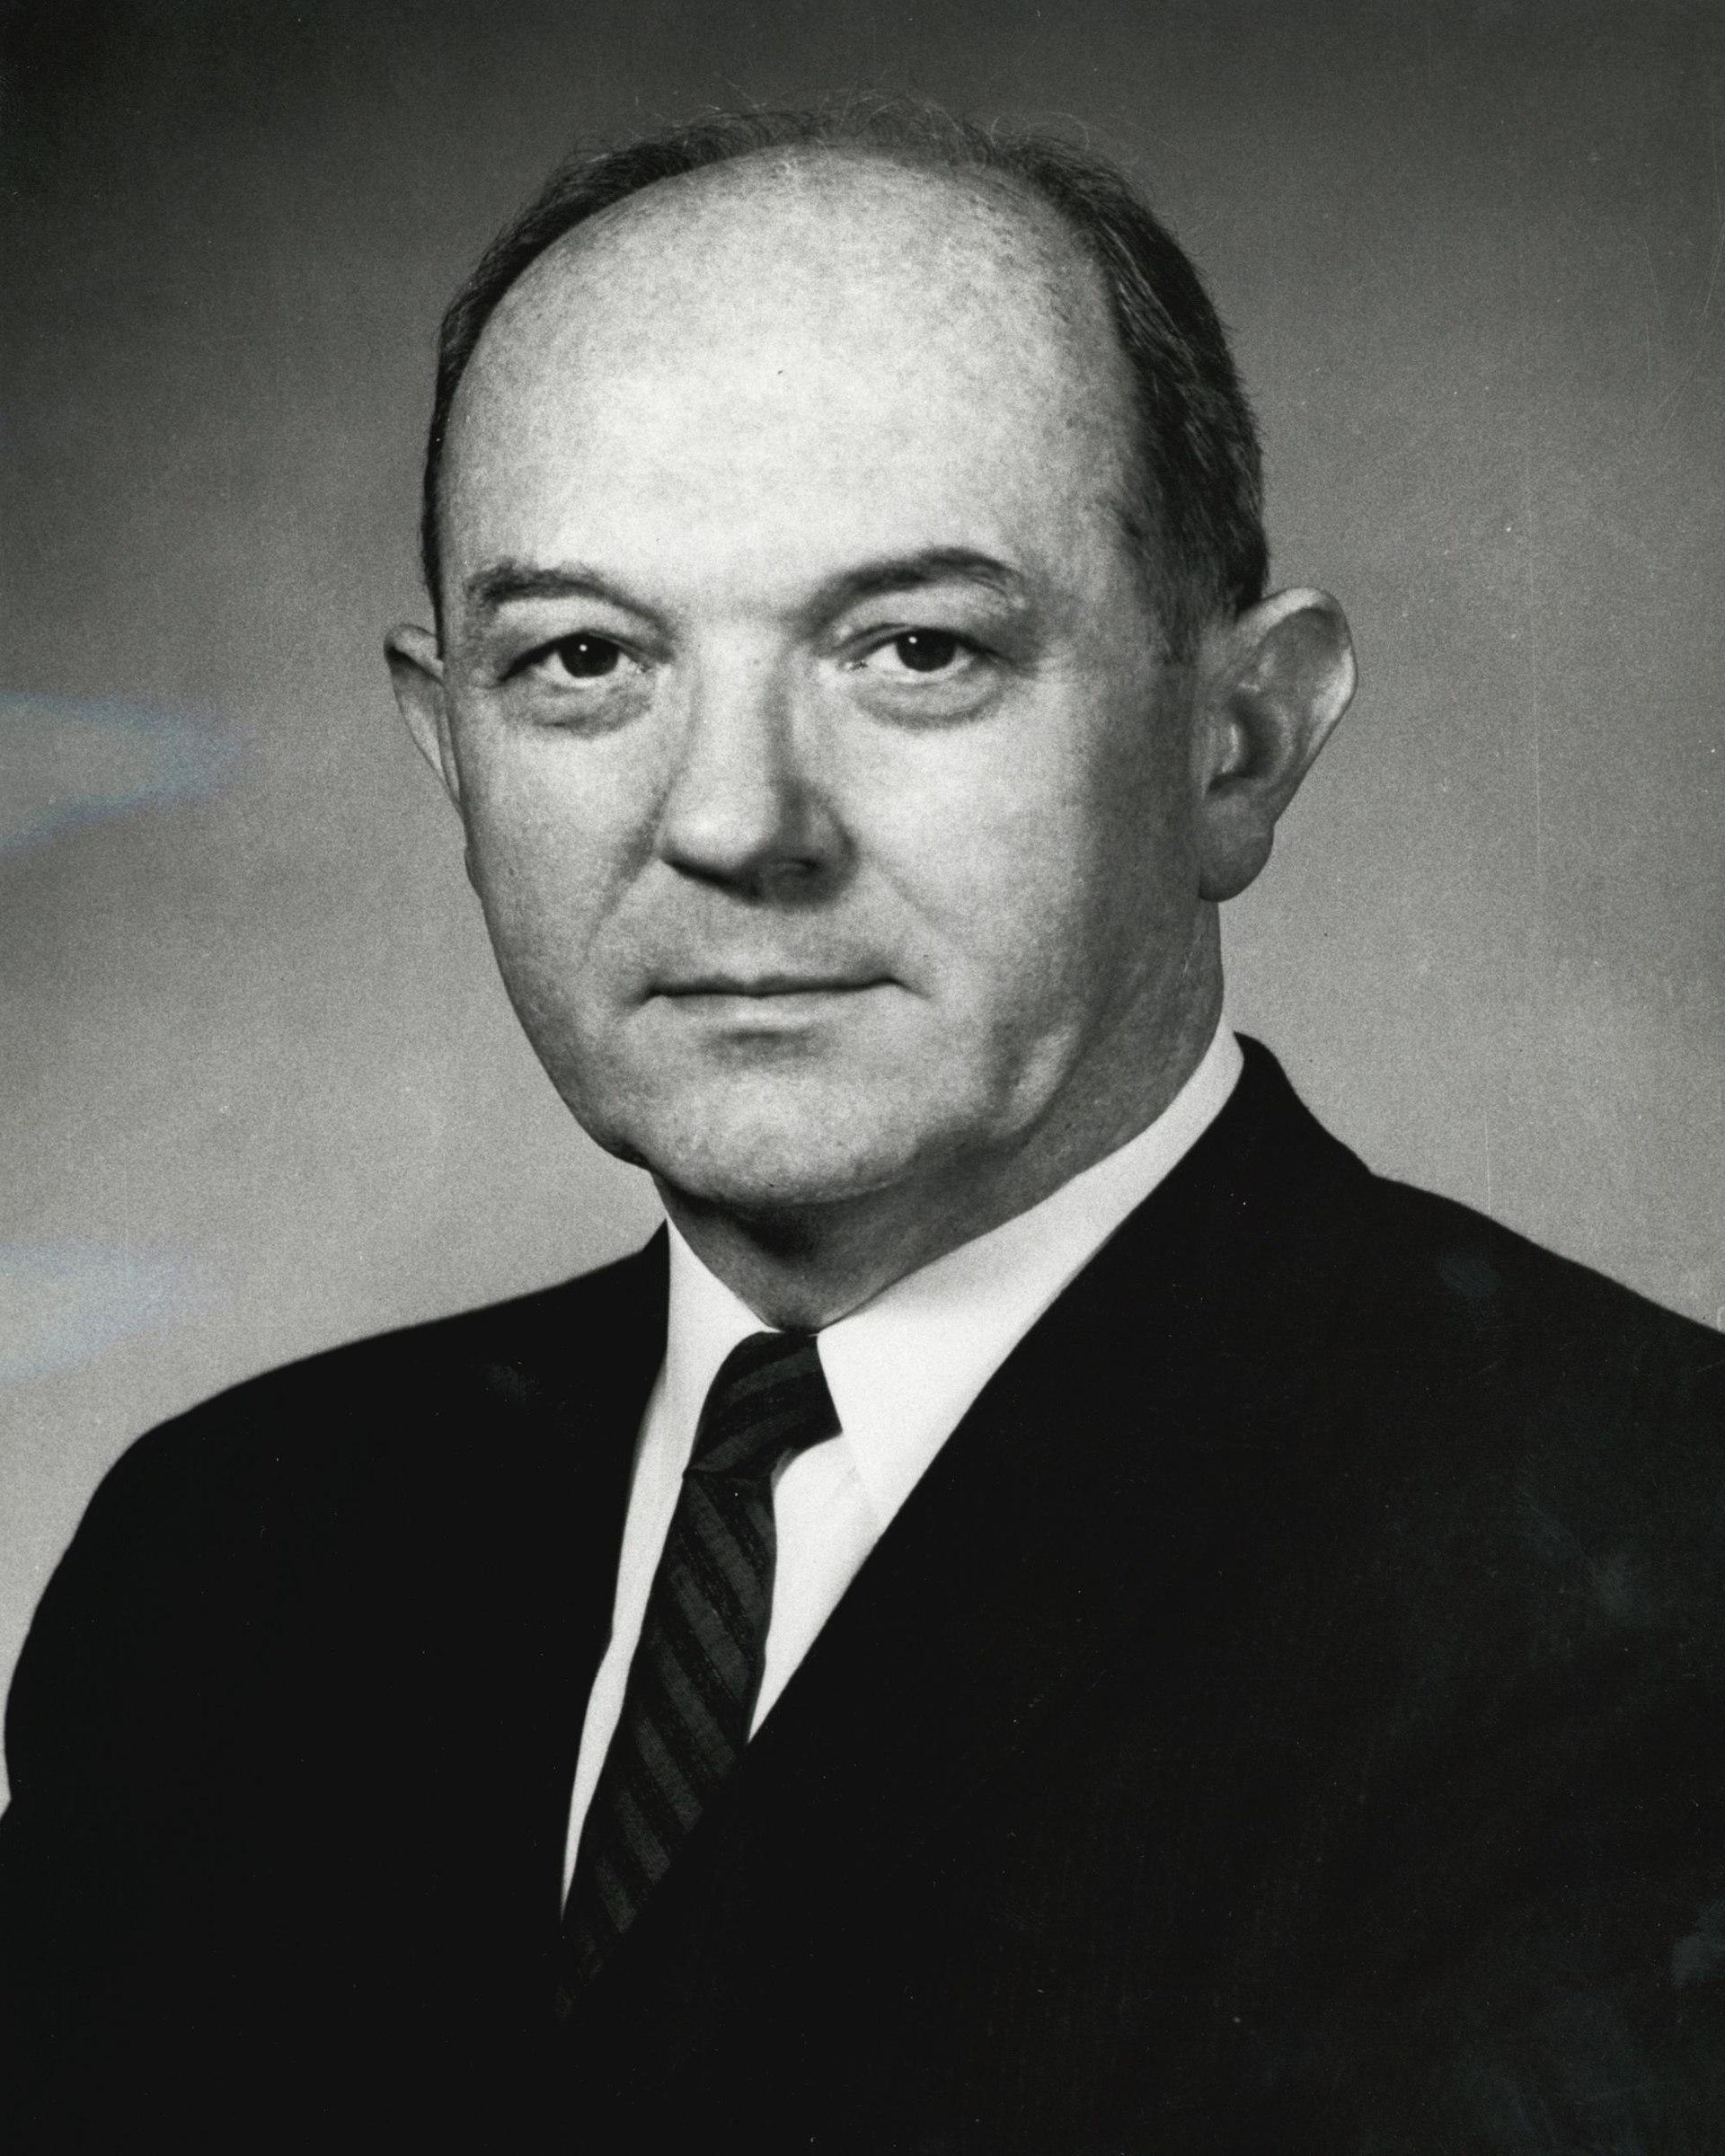 Dean Rusk Wikipedia